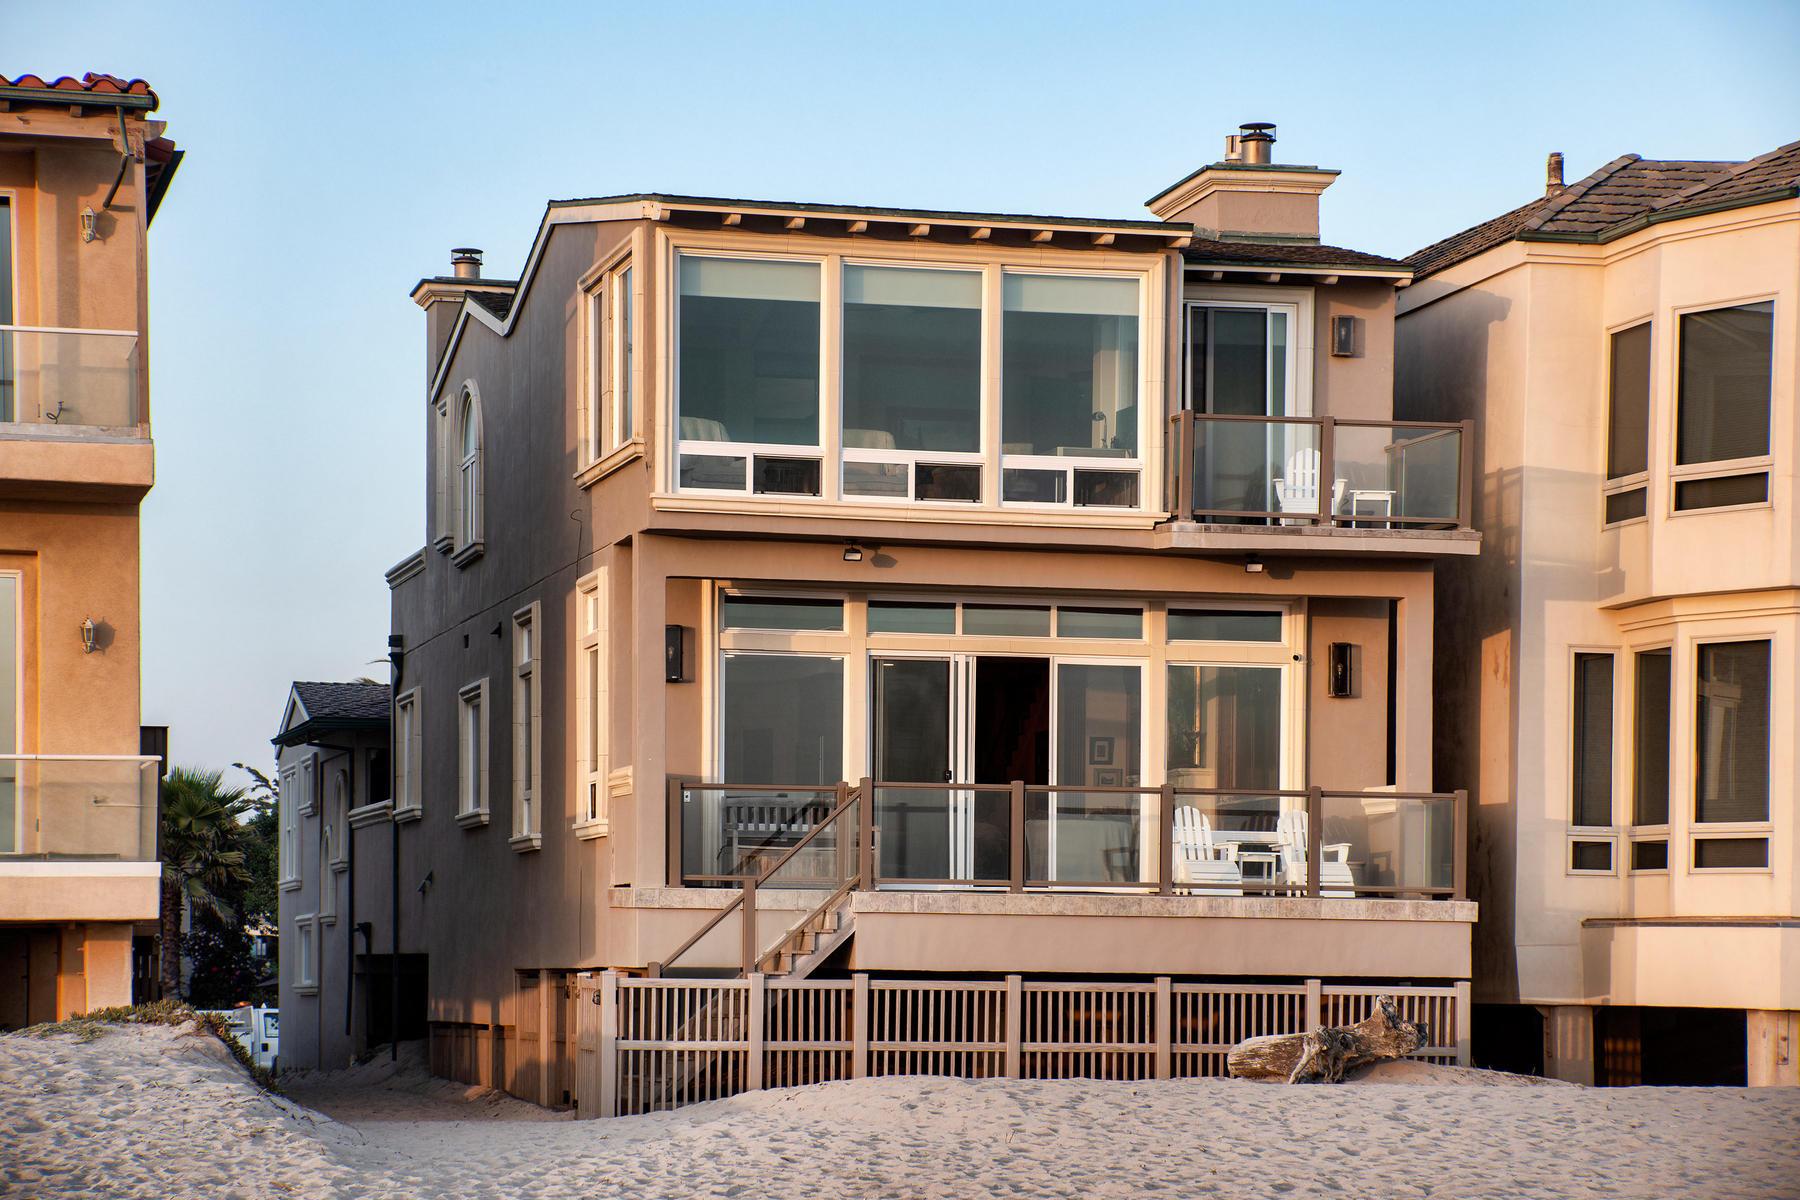 Property 为 销售 在 1073 Mandalay Beach Road 1073 Mandalay Beach Road 奥克斯纳德, 加利福尼亚州 93035 美国